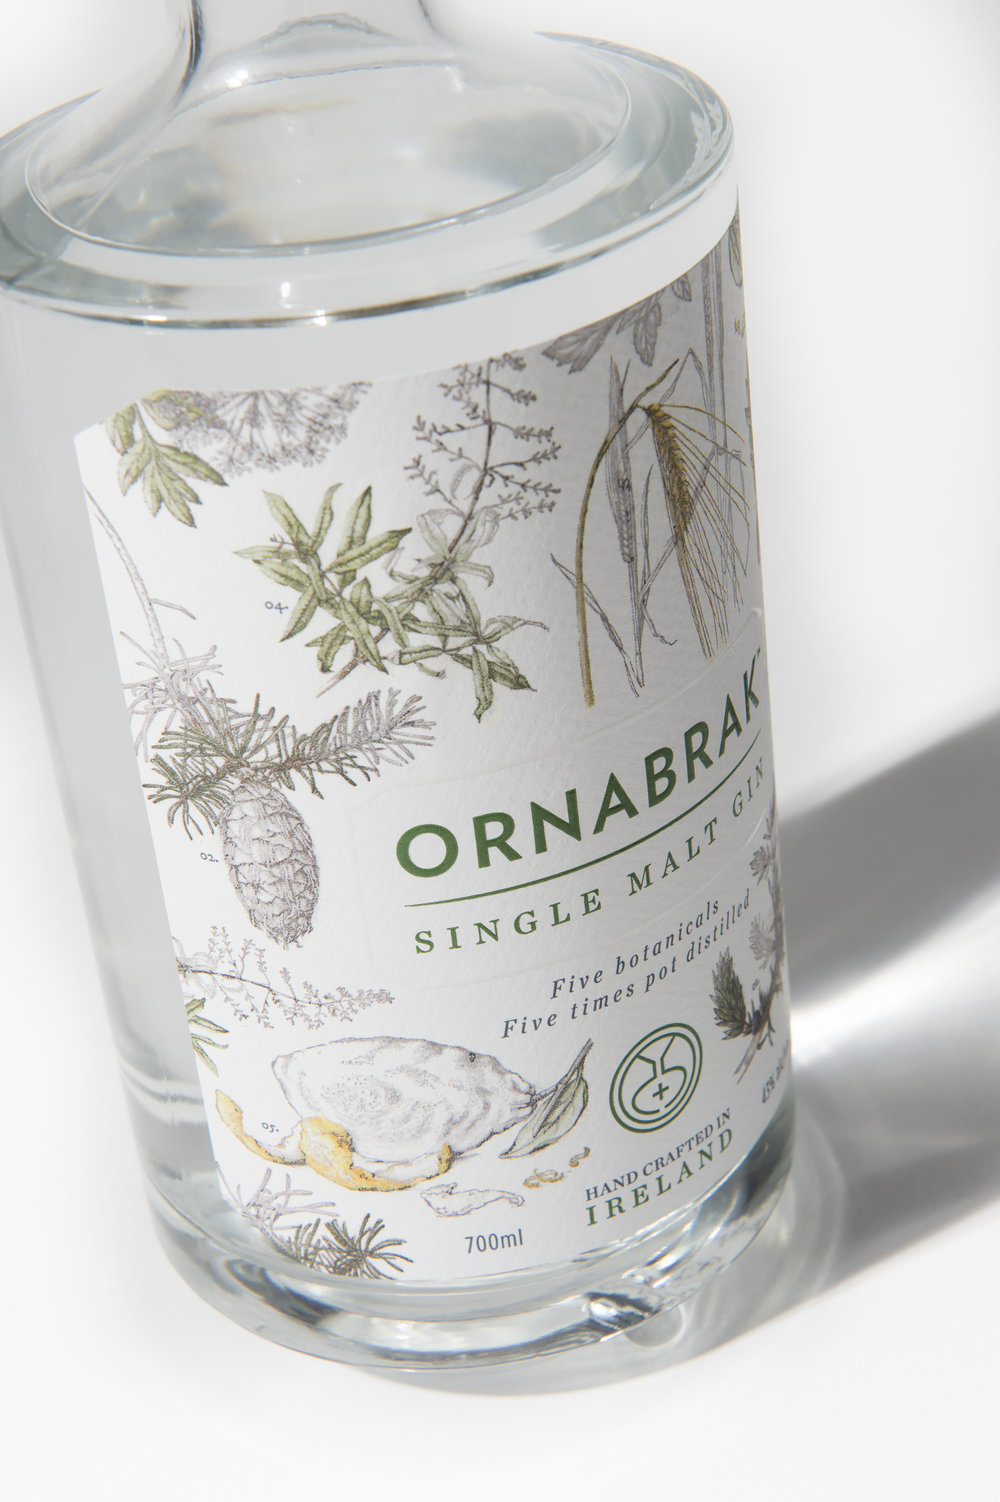 Ornabrak_Single_Malt_Gin_5_187127.jpg